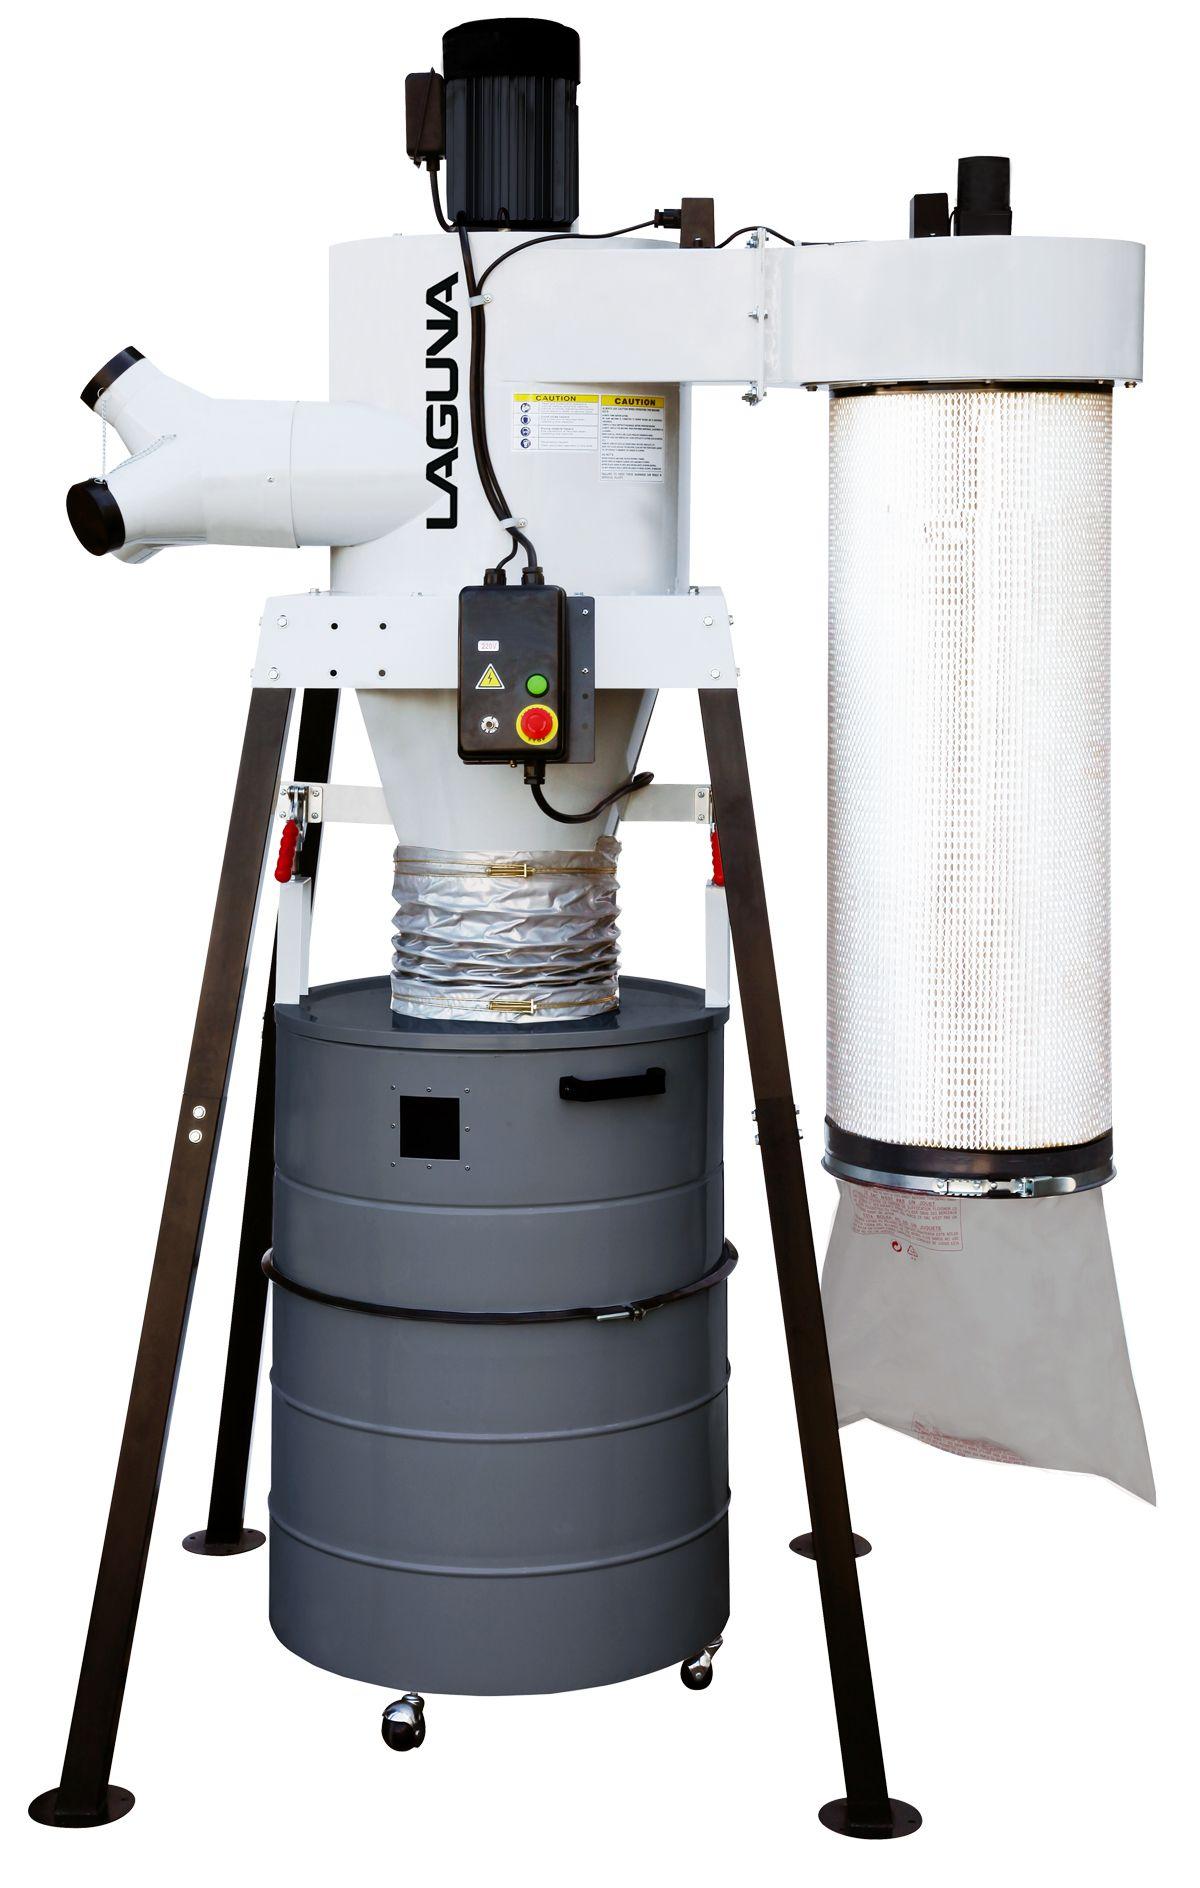 Dust Collector Category Dust collector, Dust collection